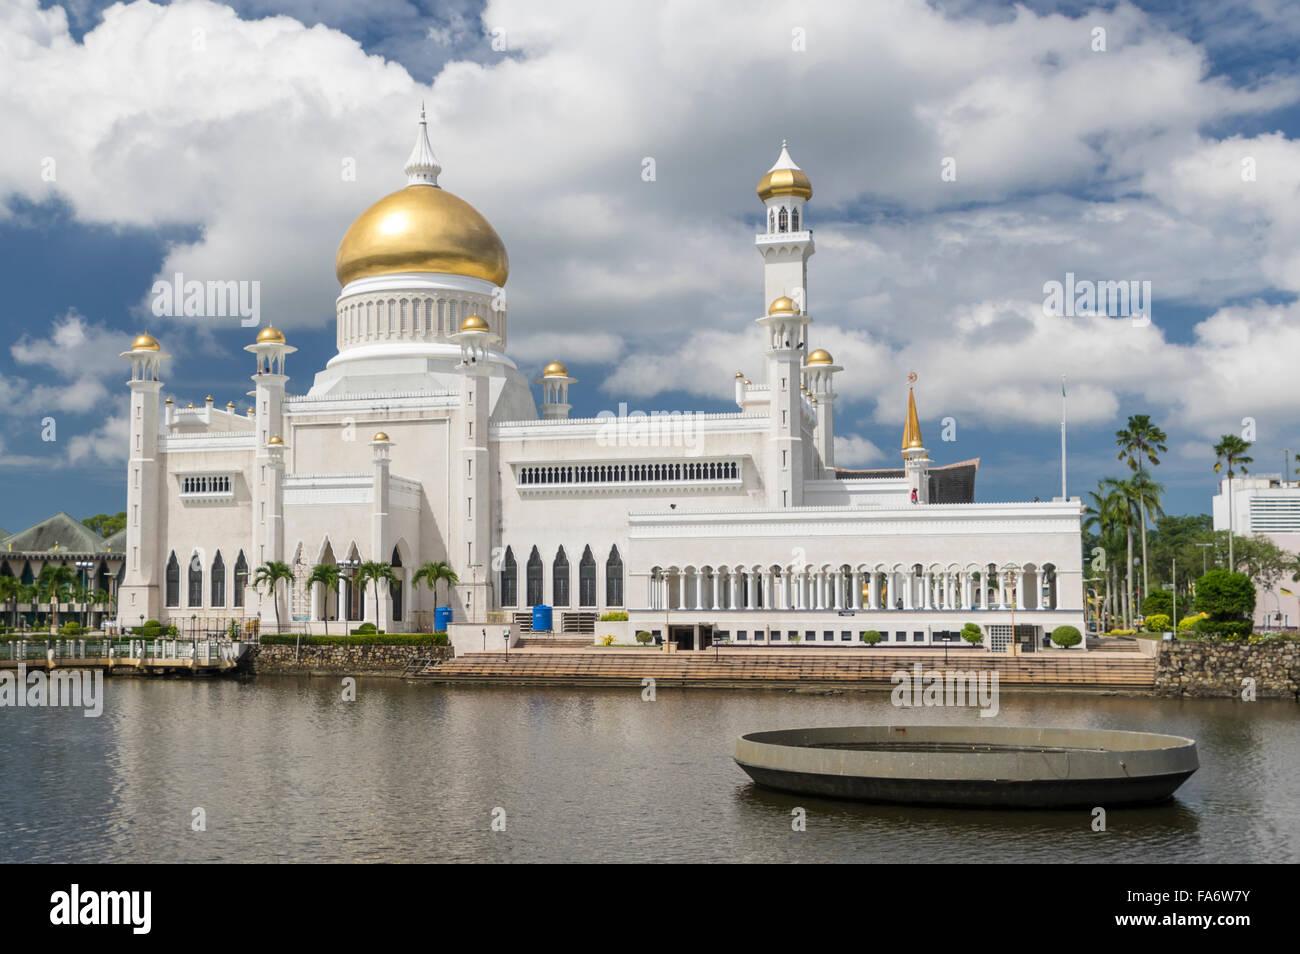 Masjid Omar 'Ali Saifuddien mosque in Bandar Seri Begawan, capital of the sultanate of Brunei Darussalam, on - Stock Image